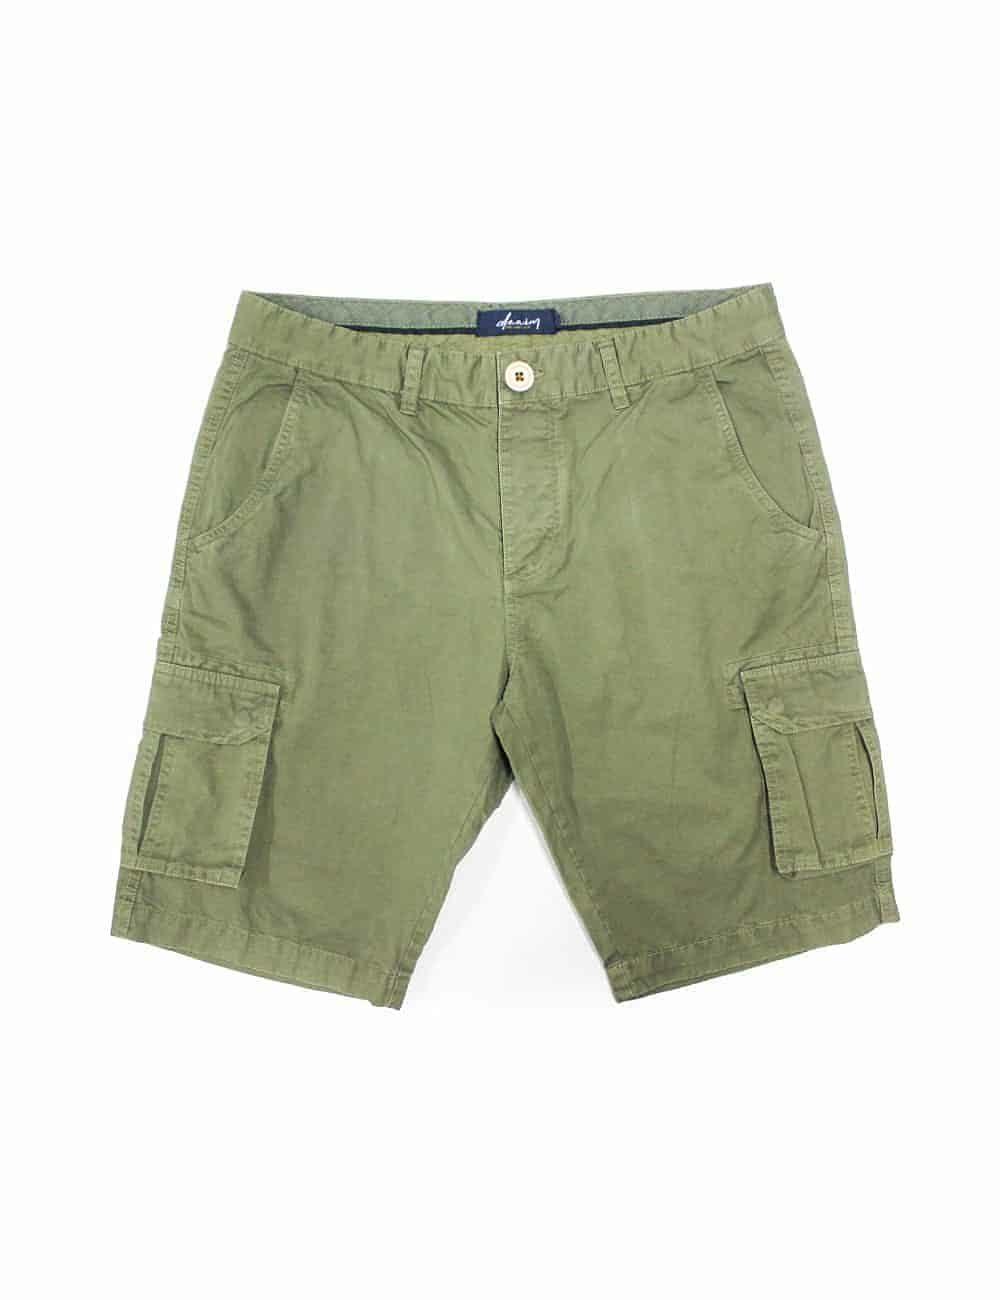 Solid Green Cargo Shorts SB3.1